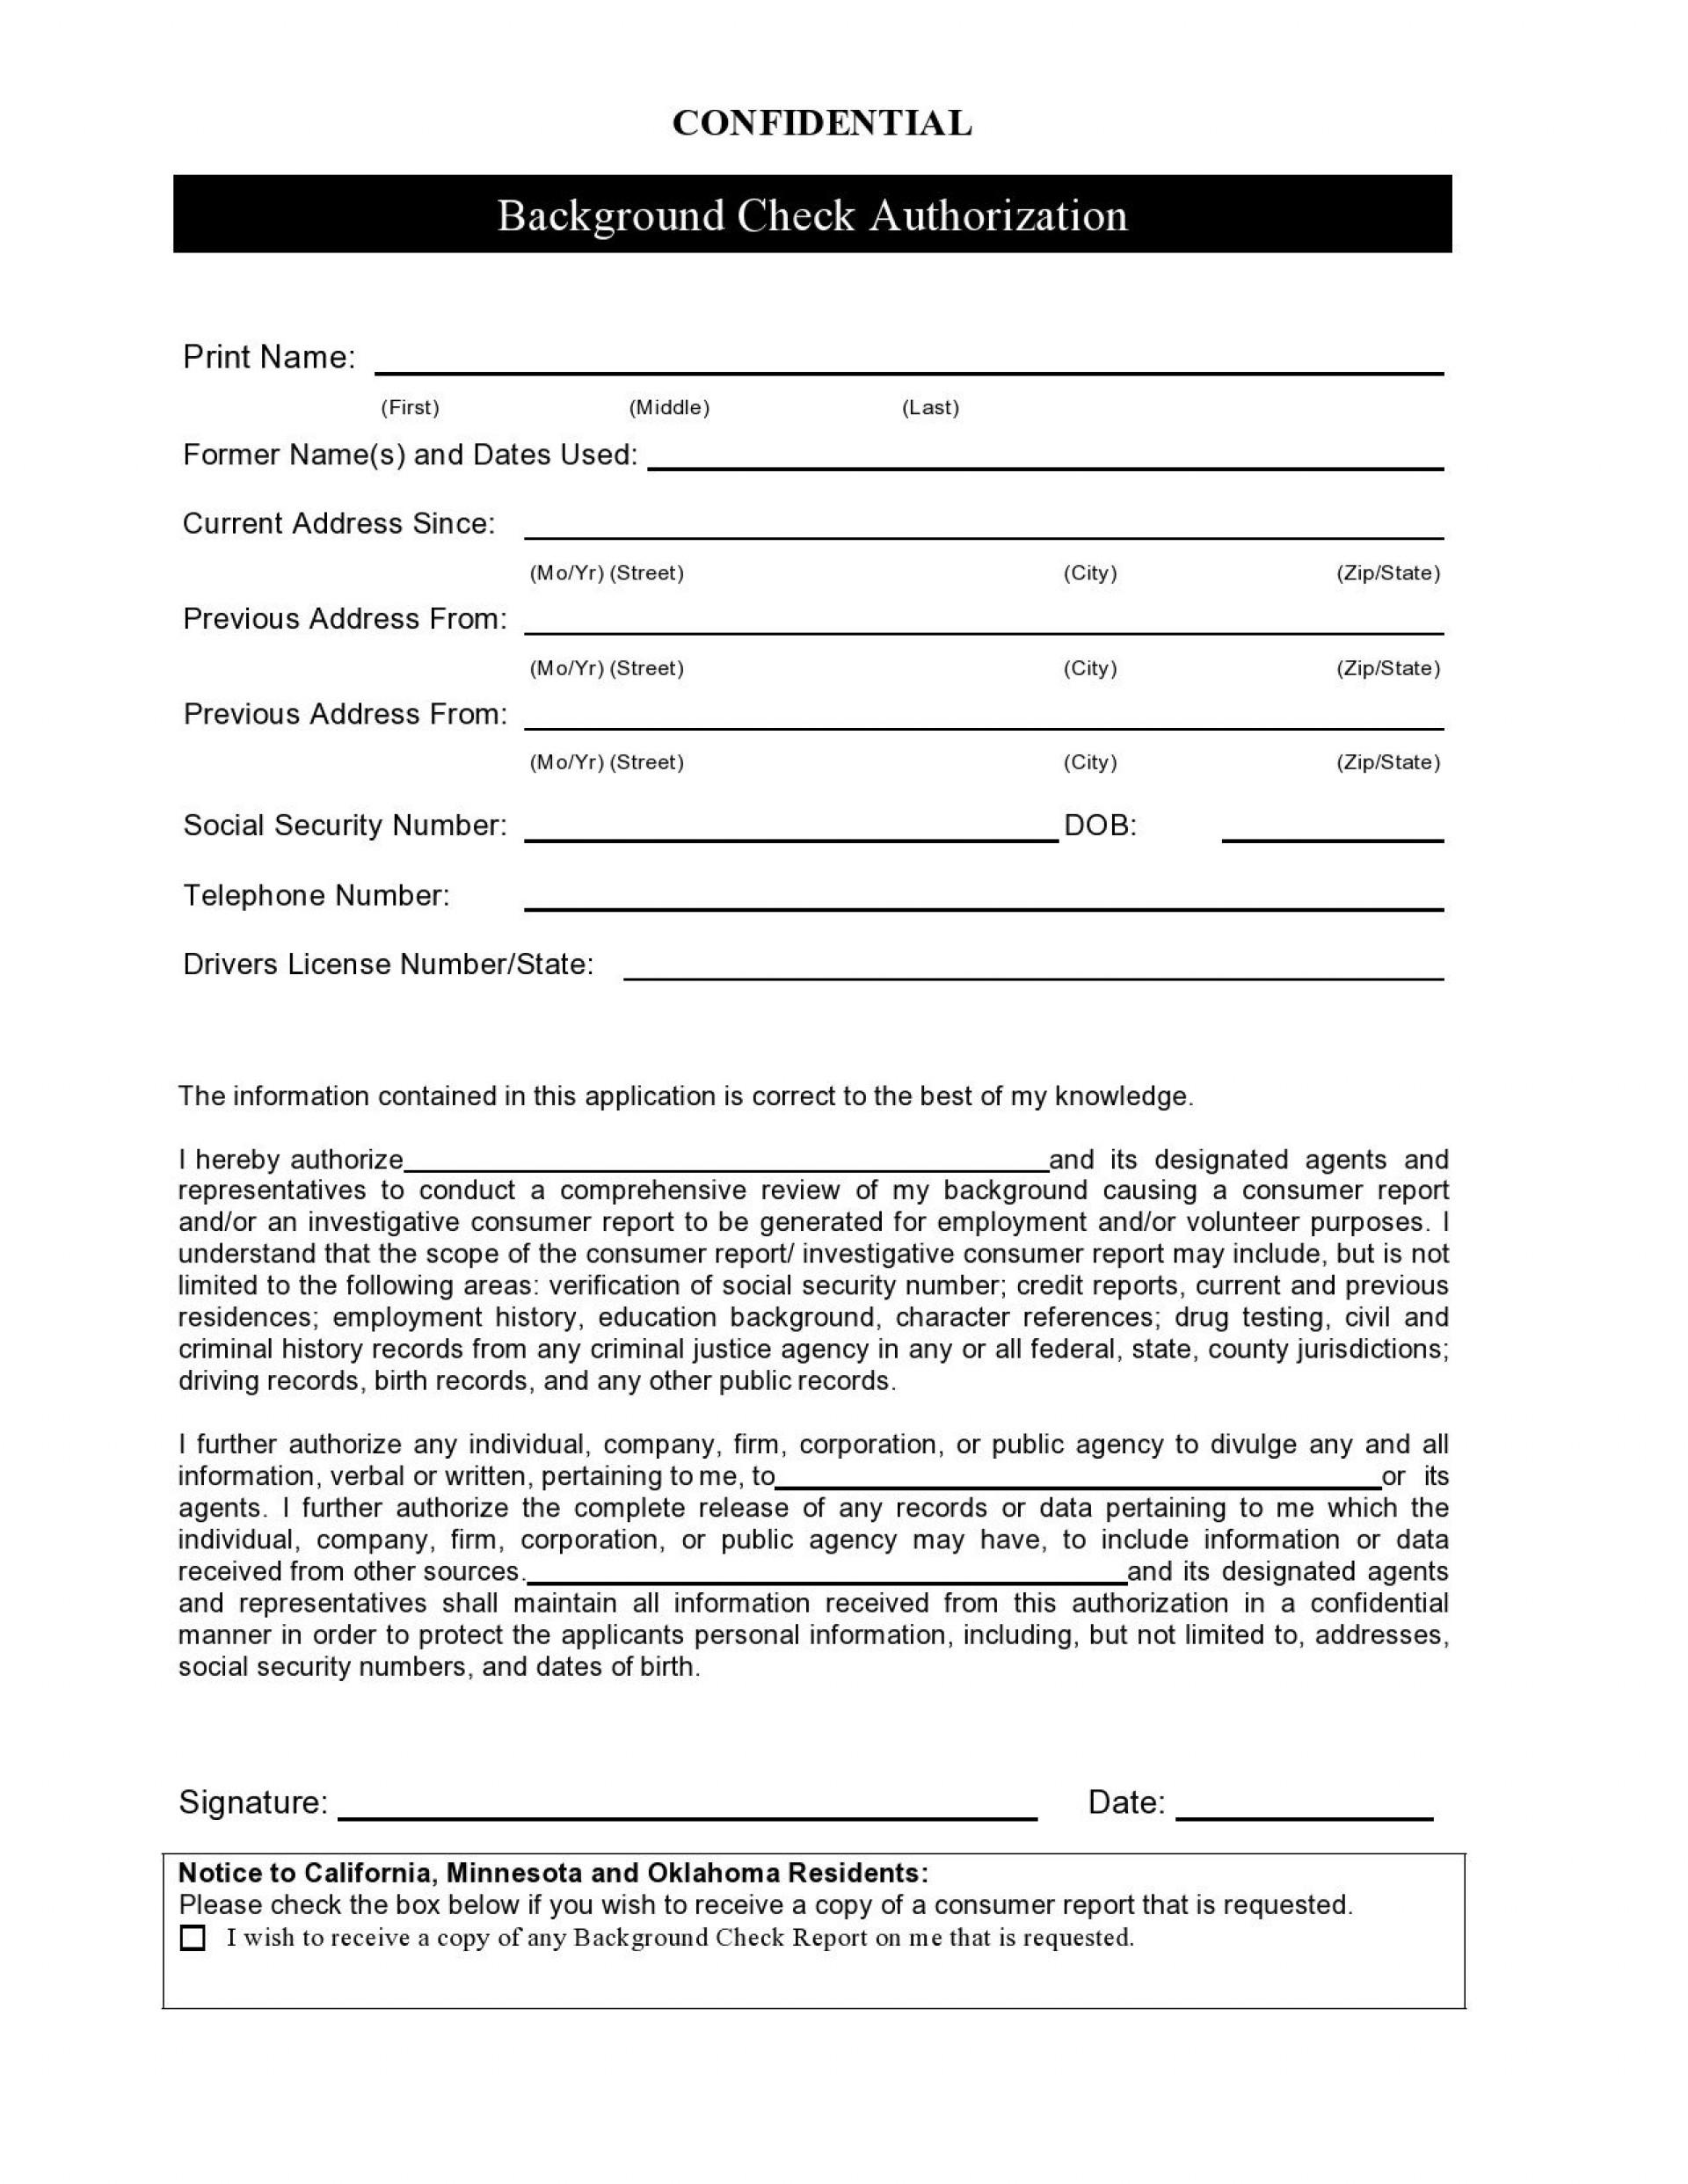 004 Amazing Background Check Form Template Free Image  Authorization1920